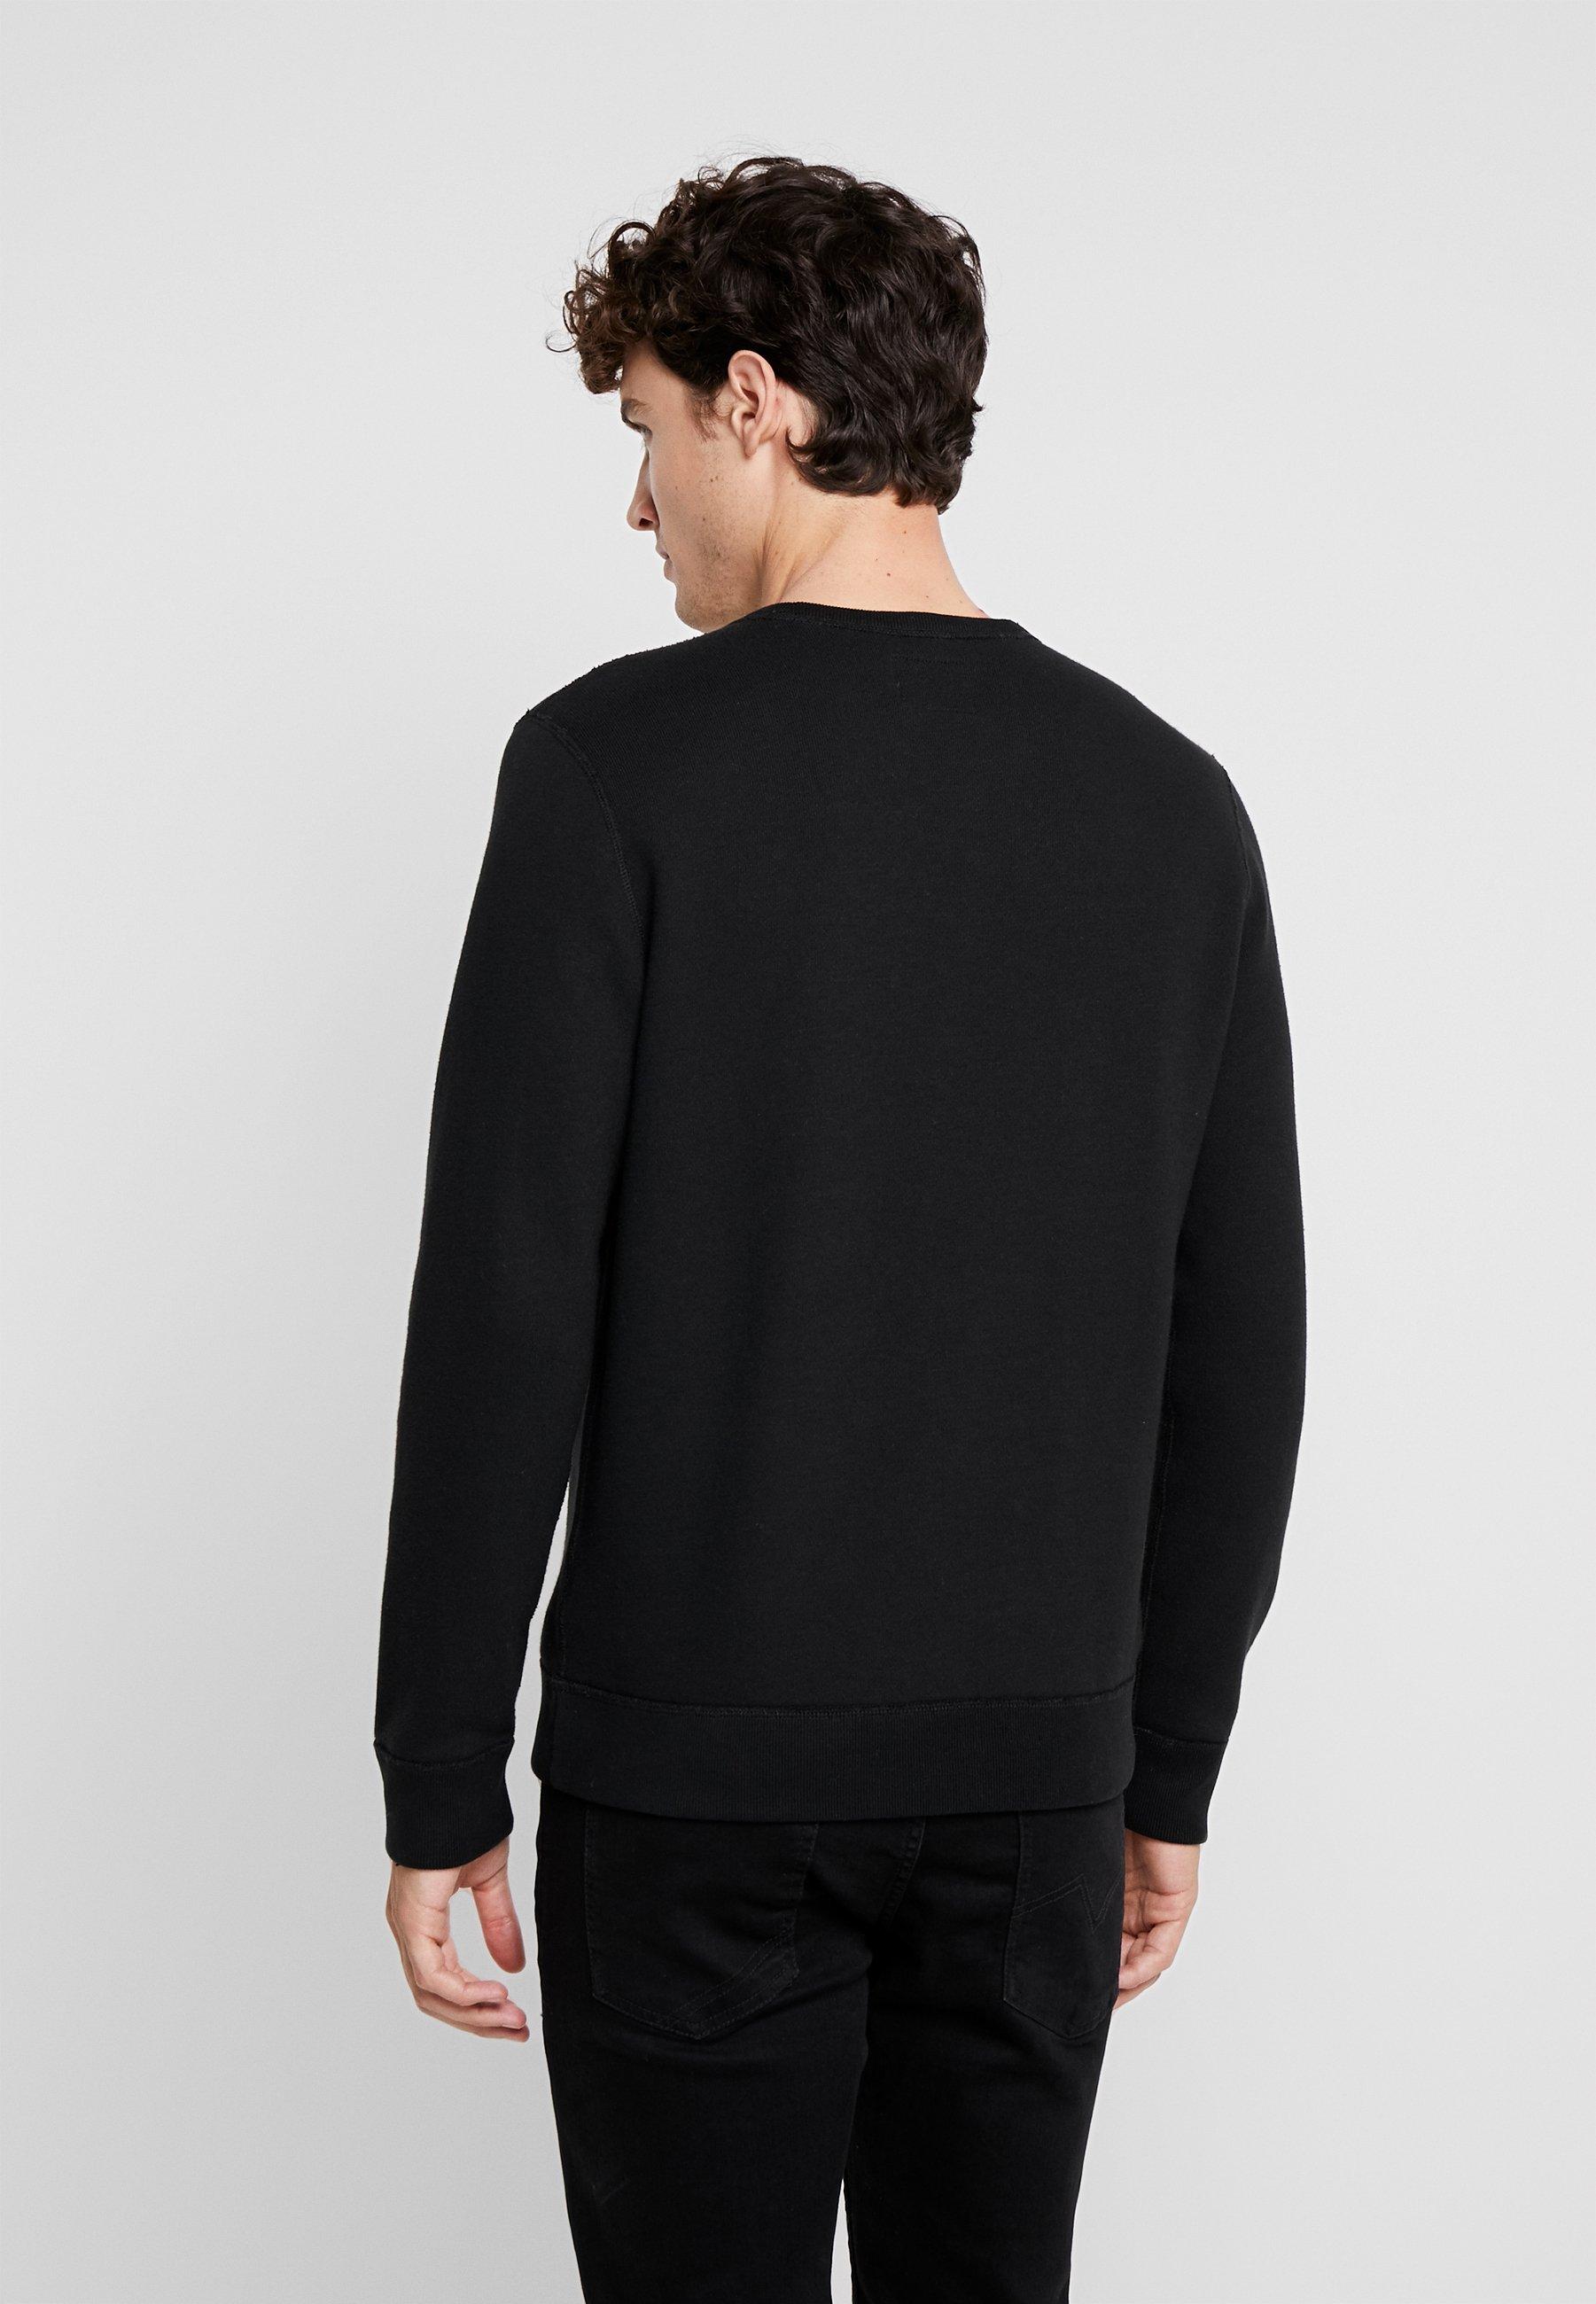 Abercrombie & Fitch Logocon Applique Crew - Sweatshirt Black Friday